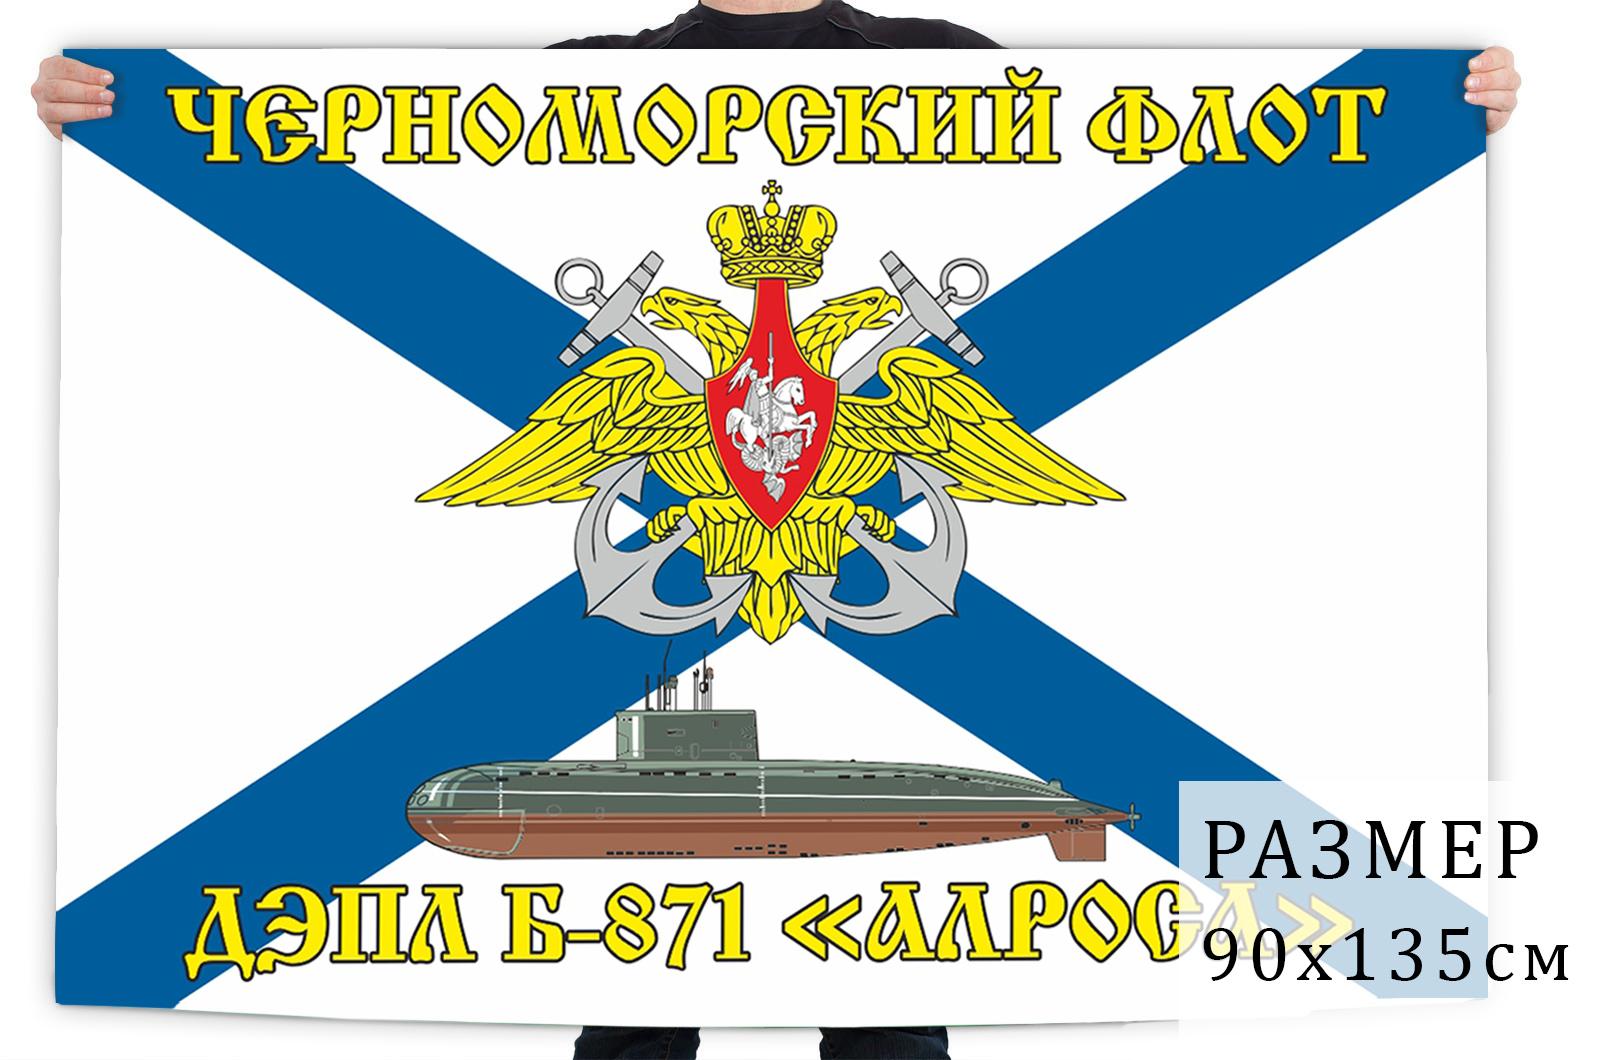 Флаг ДЭПЛ Б-871 Алроса Черноморский флот